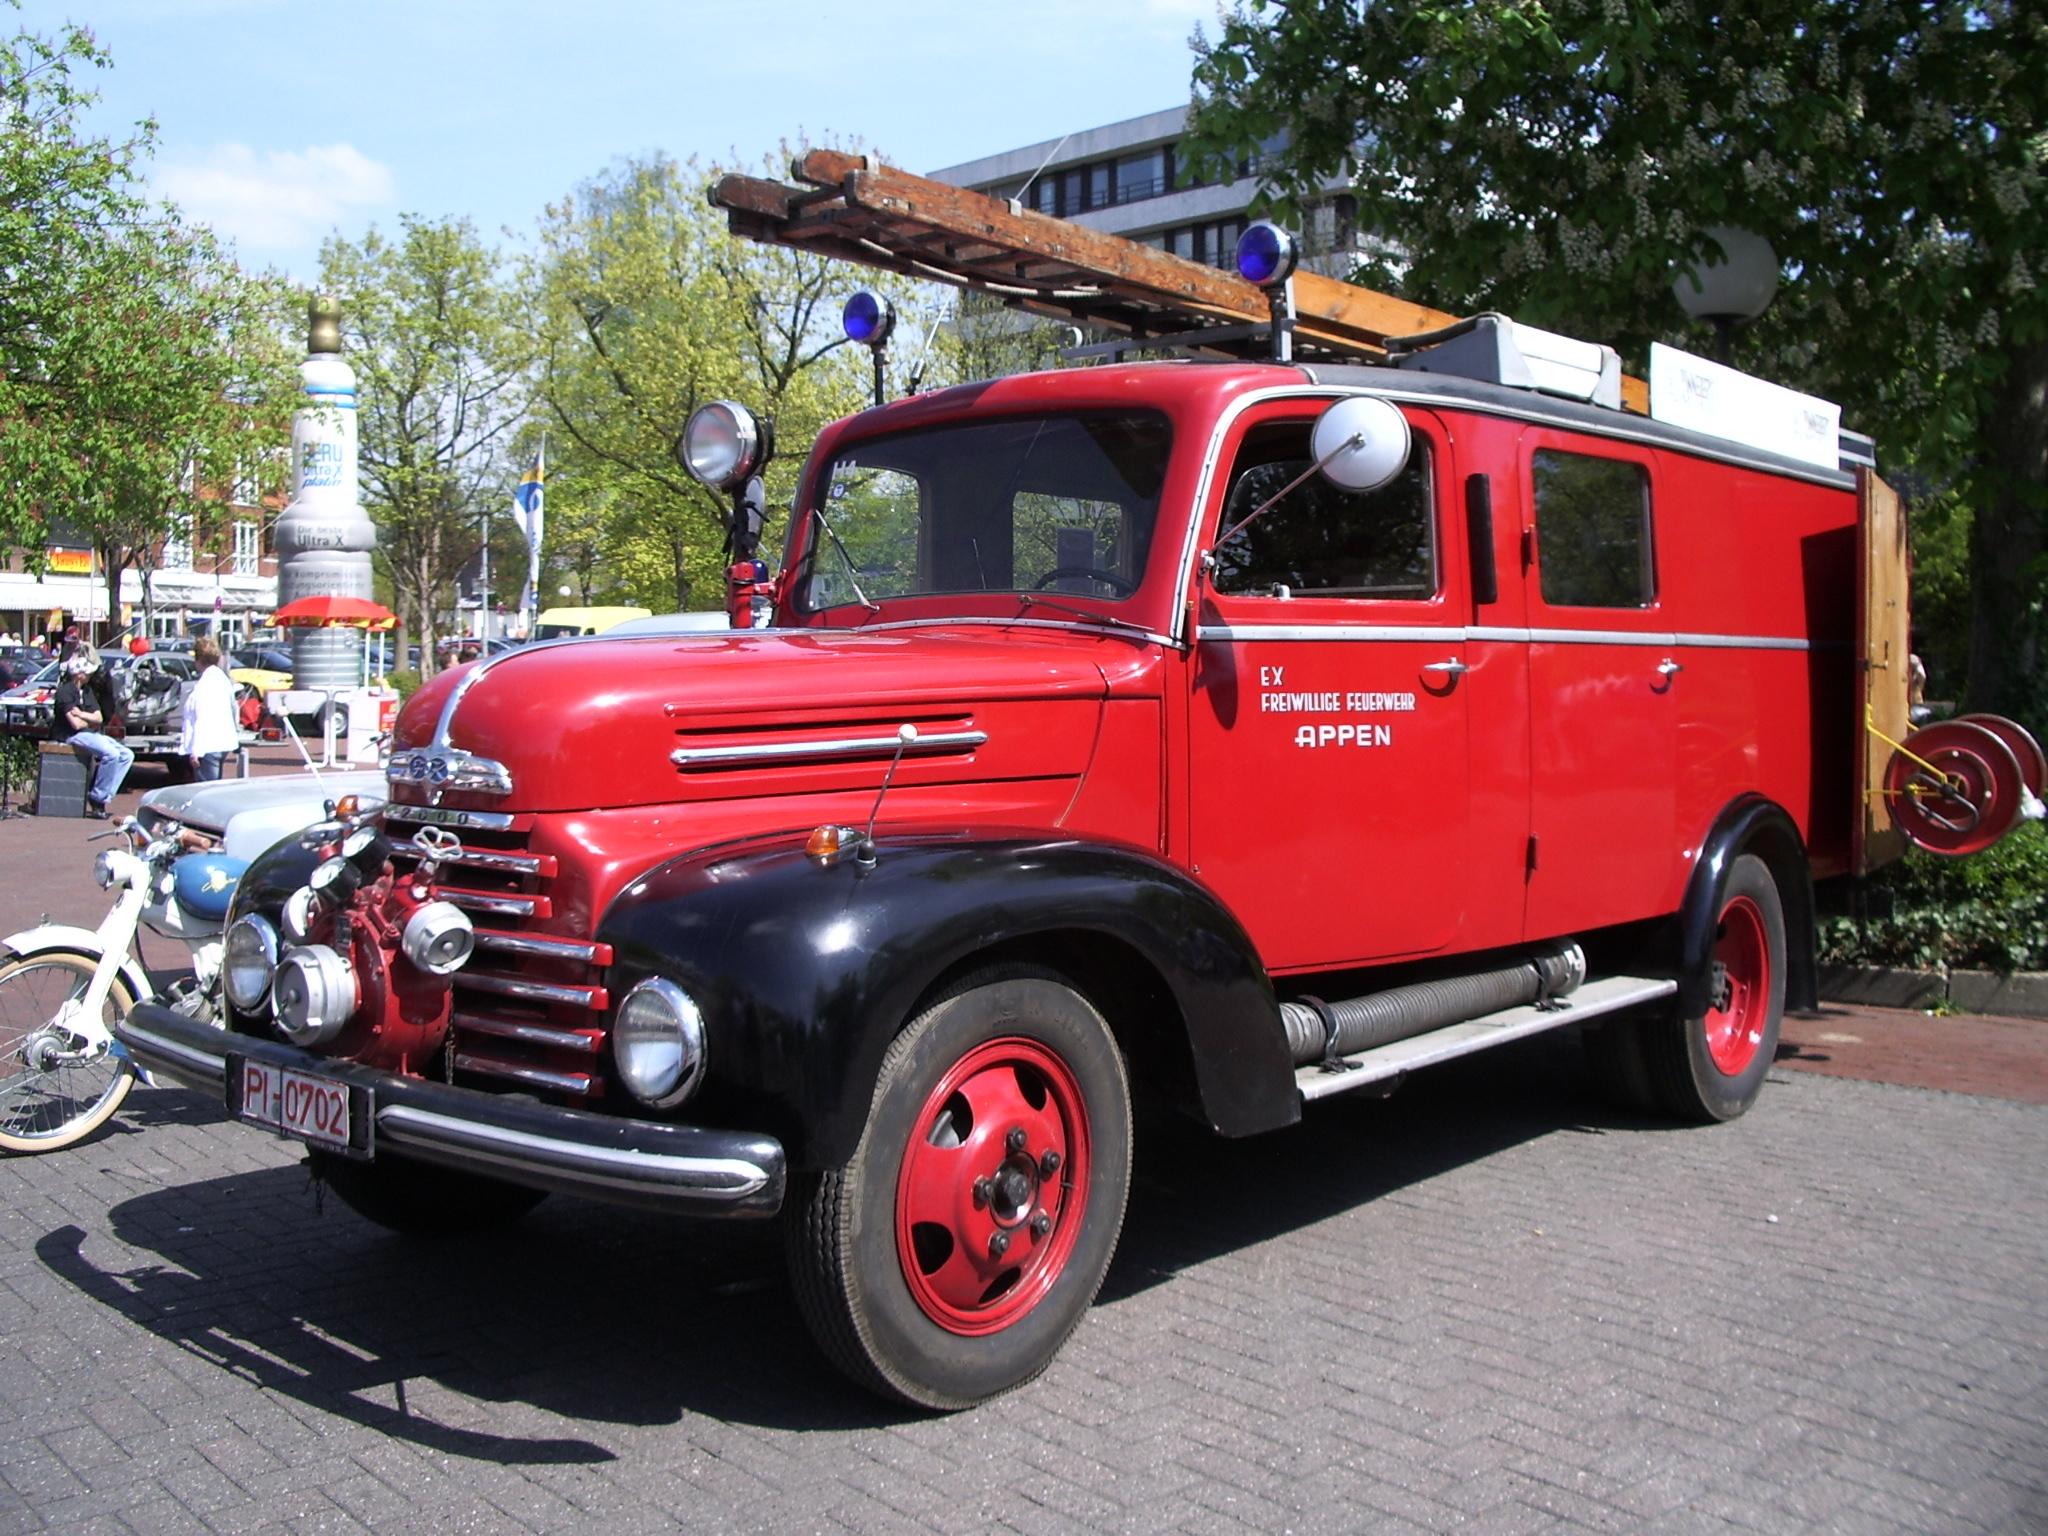 Ford Nutzfahrzeuge Köln